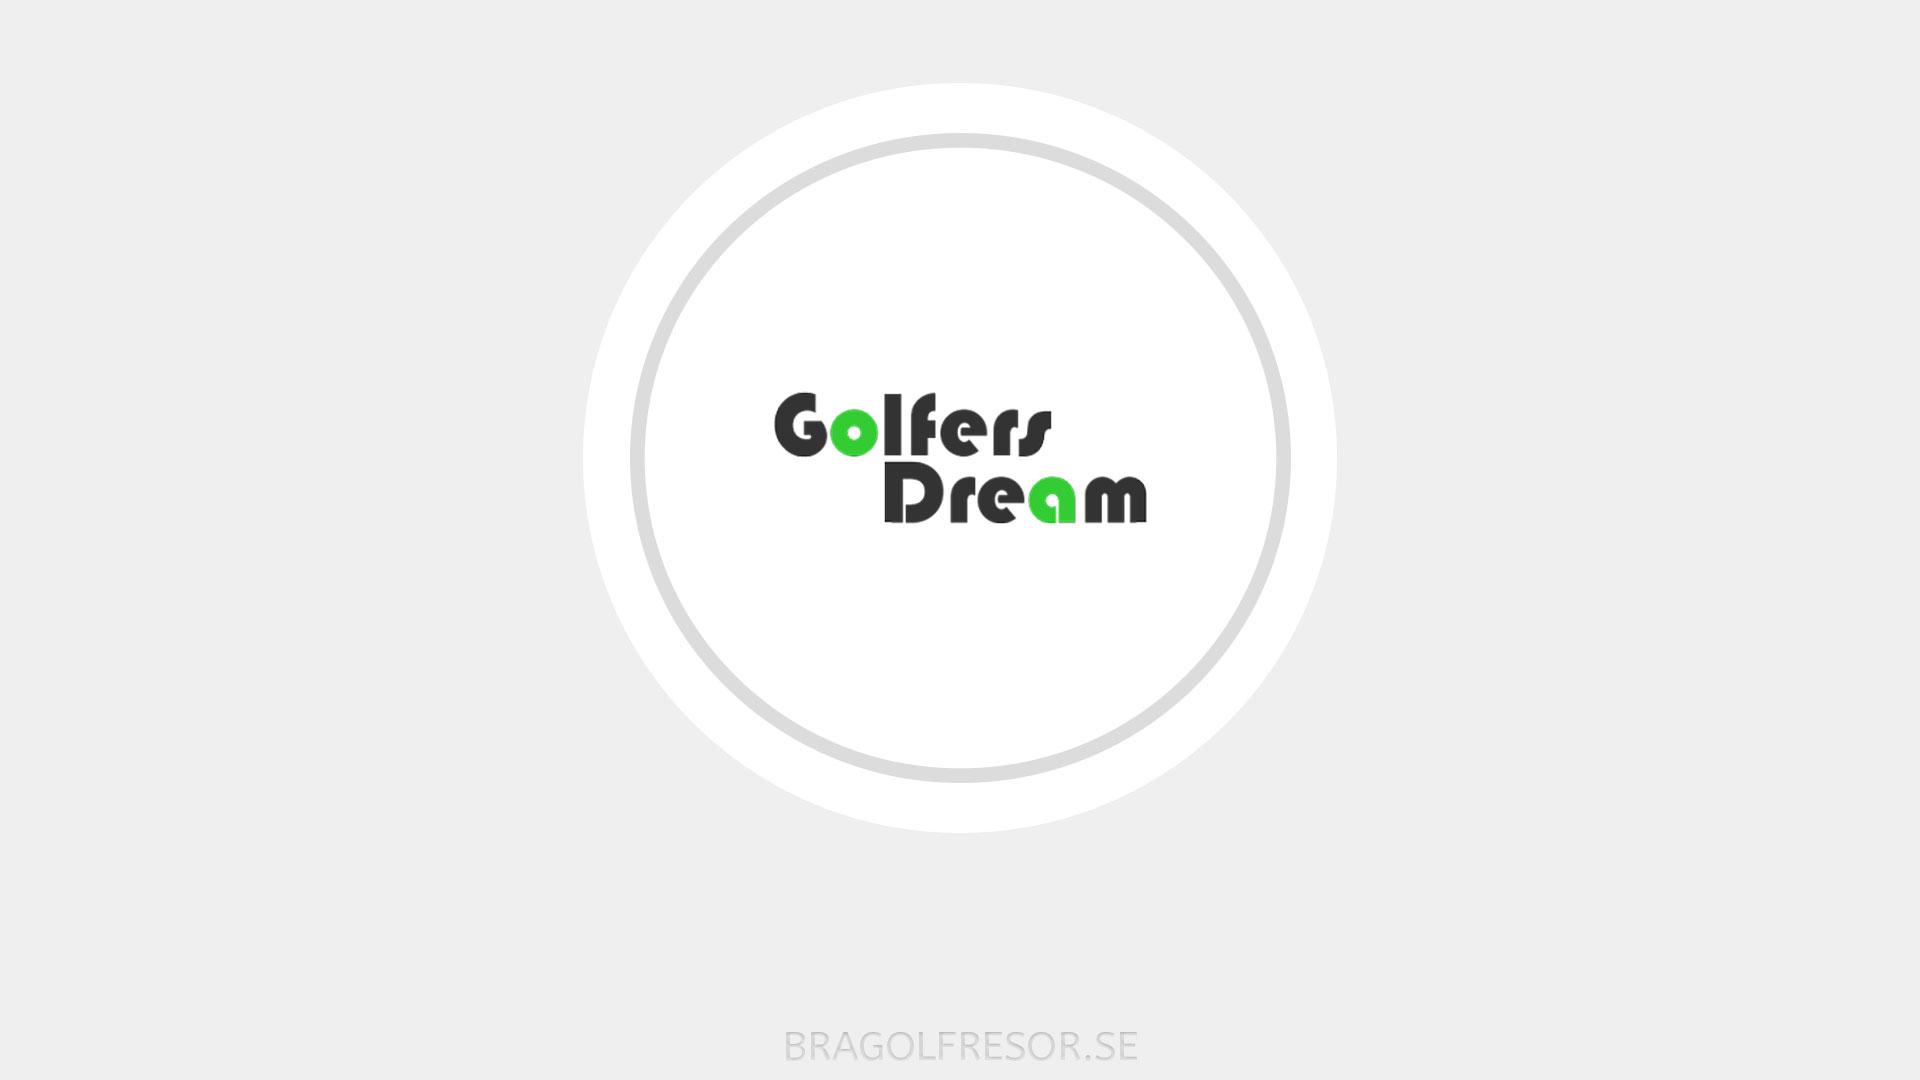 Golfersdream